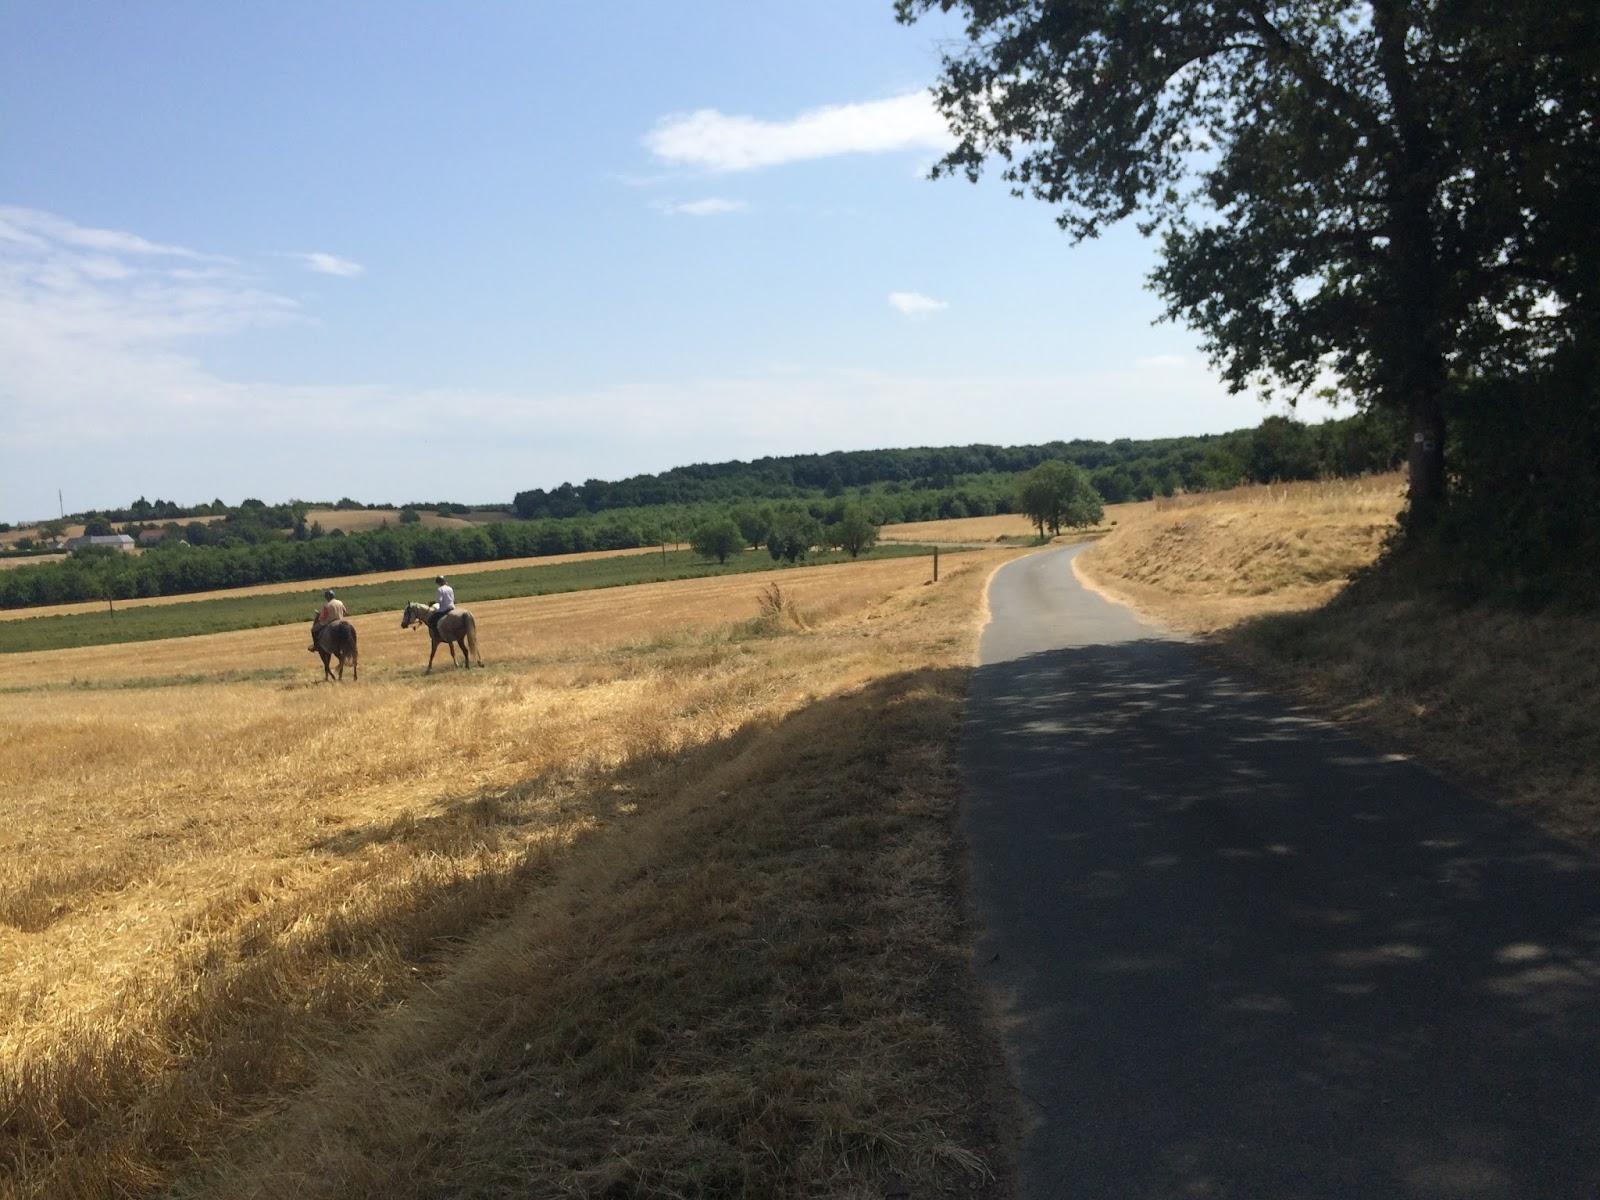 trasa rowerowa nad Loarą, droga do opactwa w Fontevraud